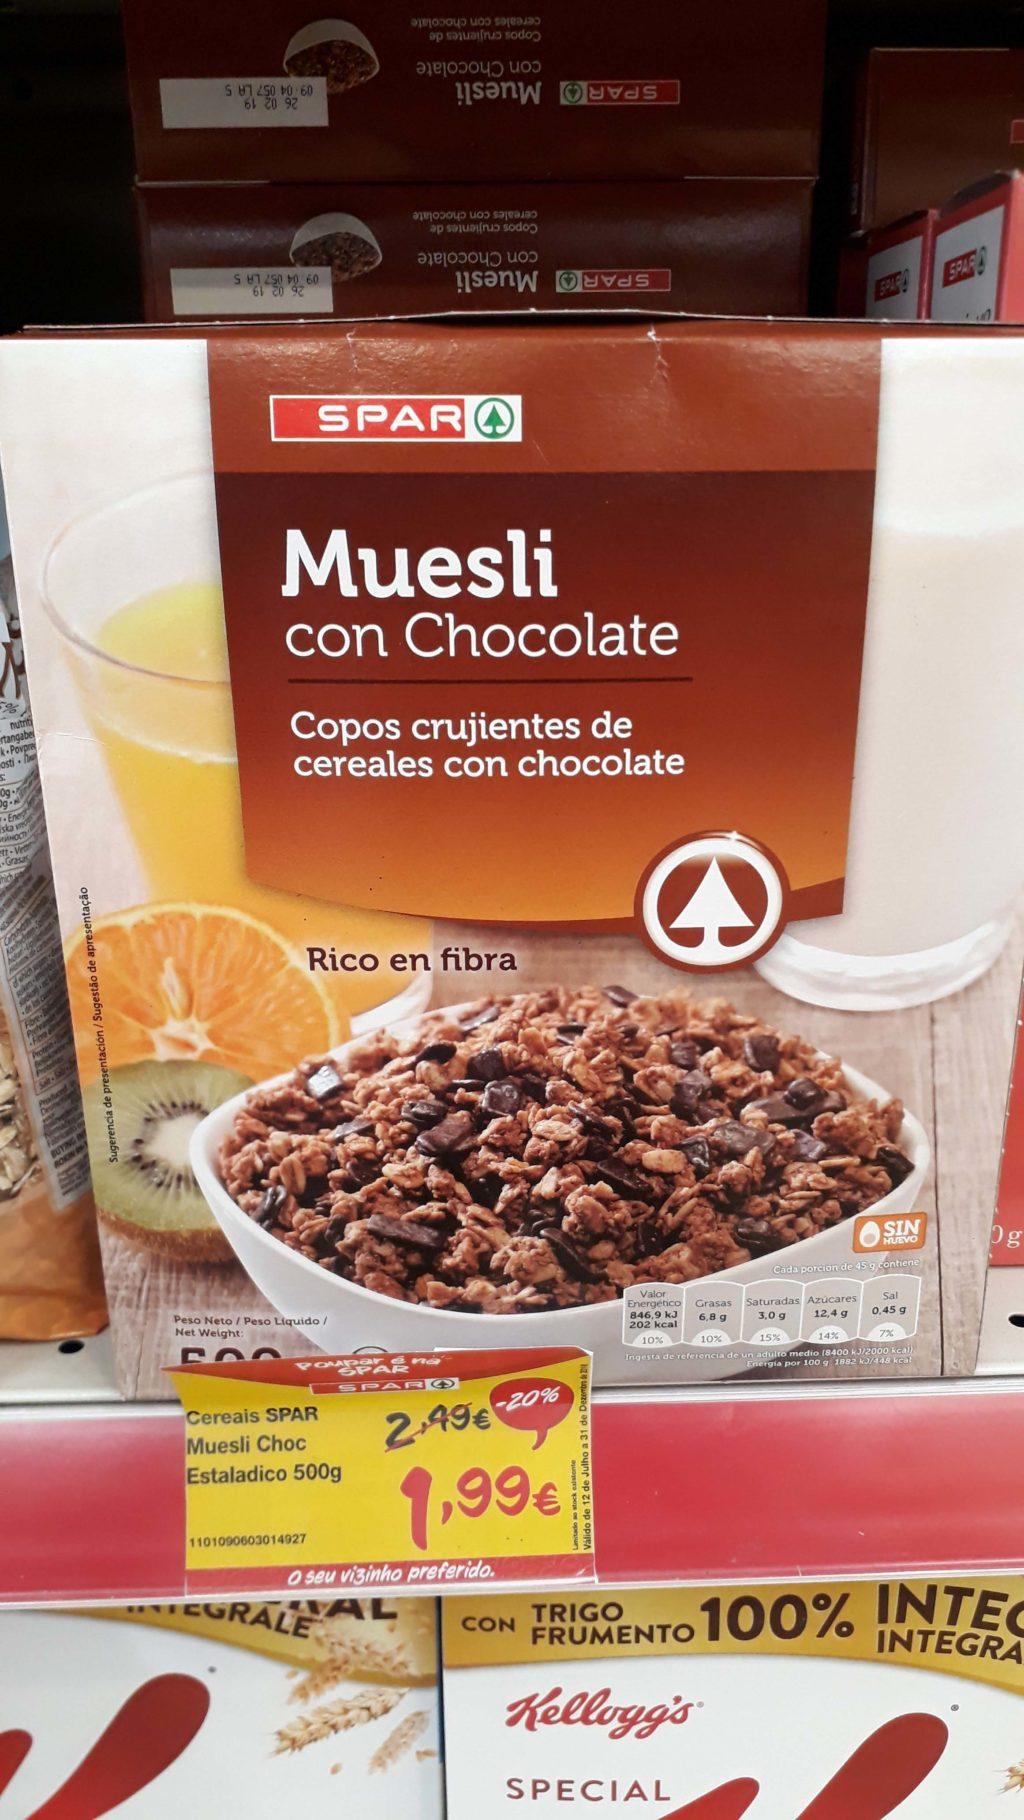 Vegan Chocolate Crunchy Muesli from Spar